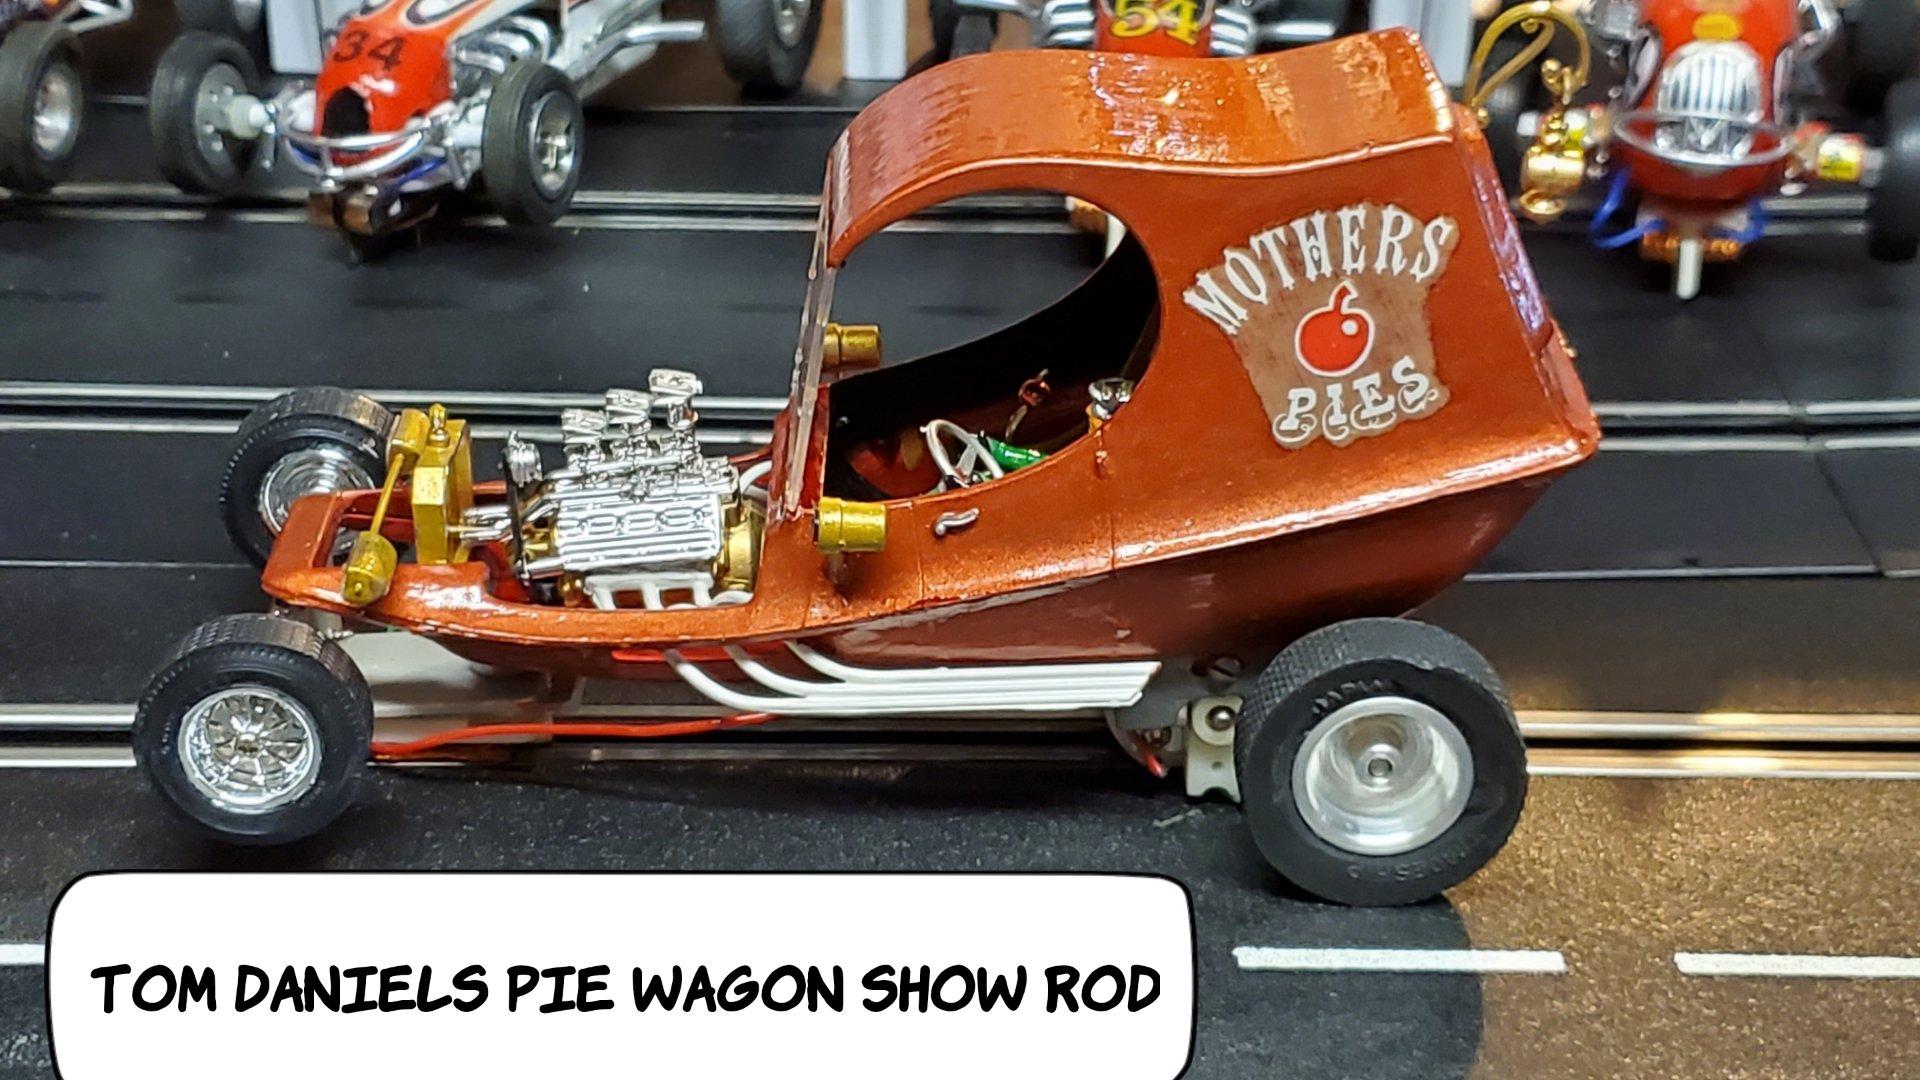 * SALE * Tom Daniels 1968 Monogram Mothers Pies Show Wagon Hot Rod 1/24 Scale Slot Car